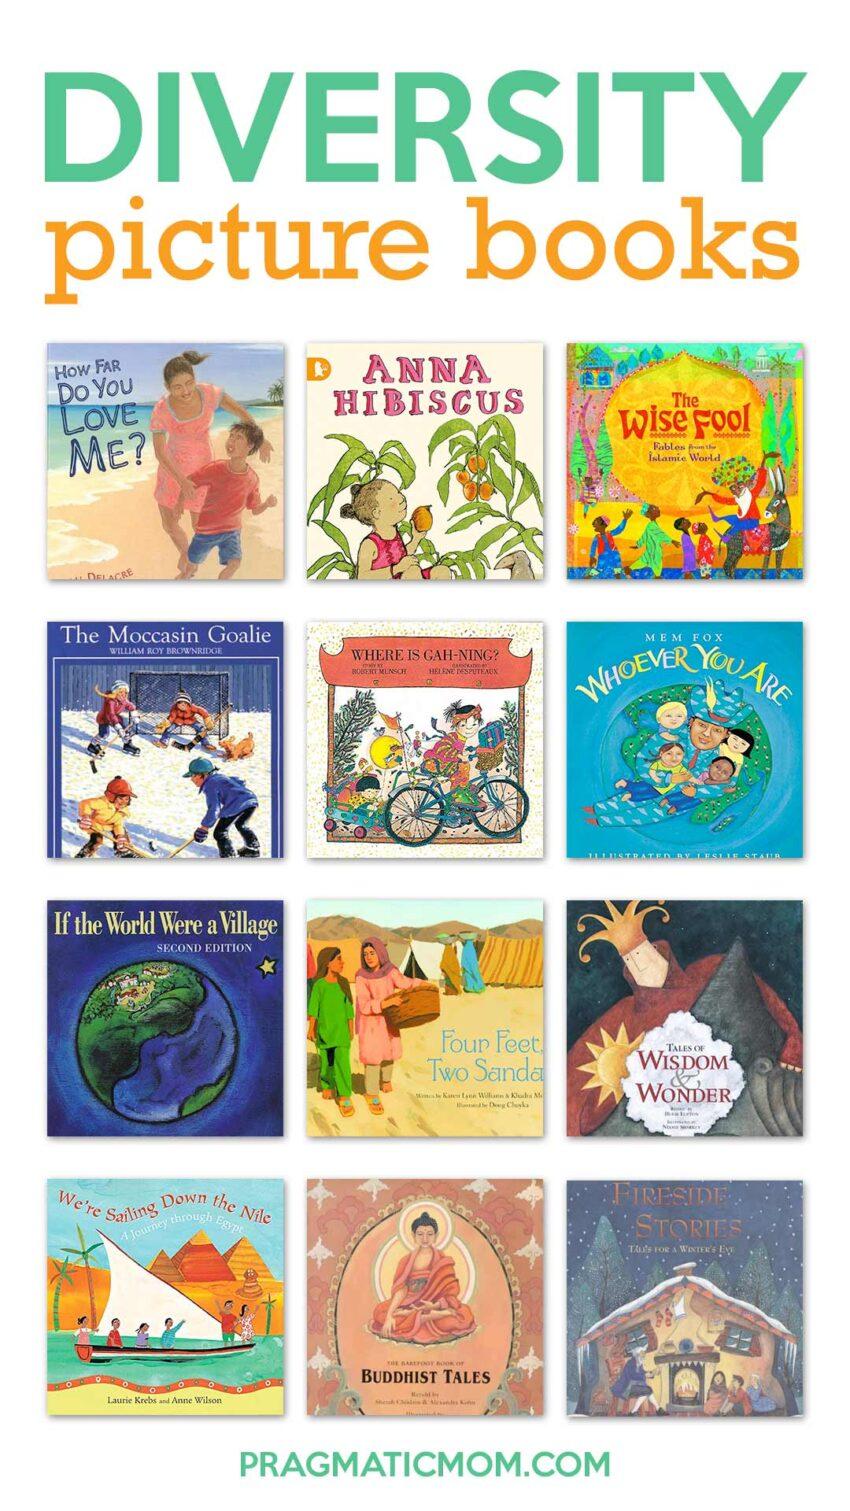 Diversity Picture Books for Children